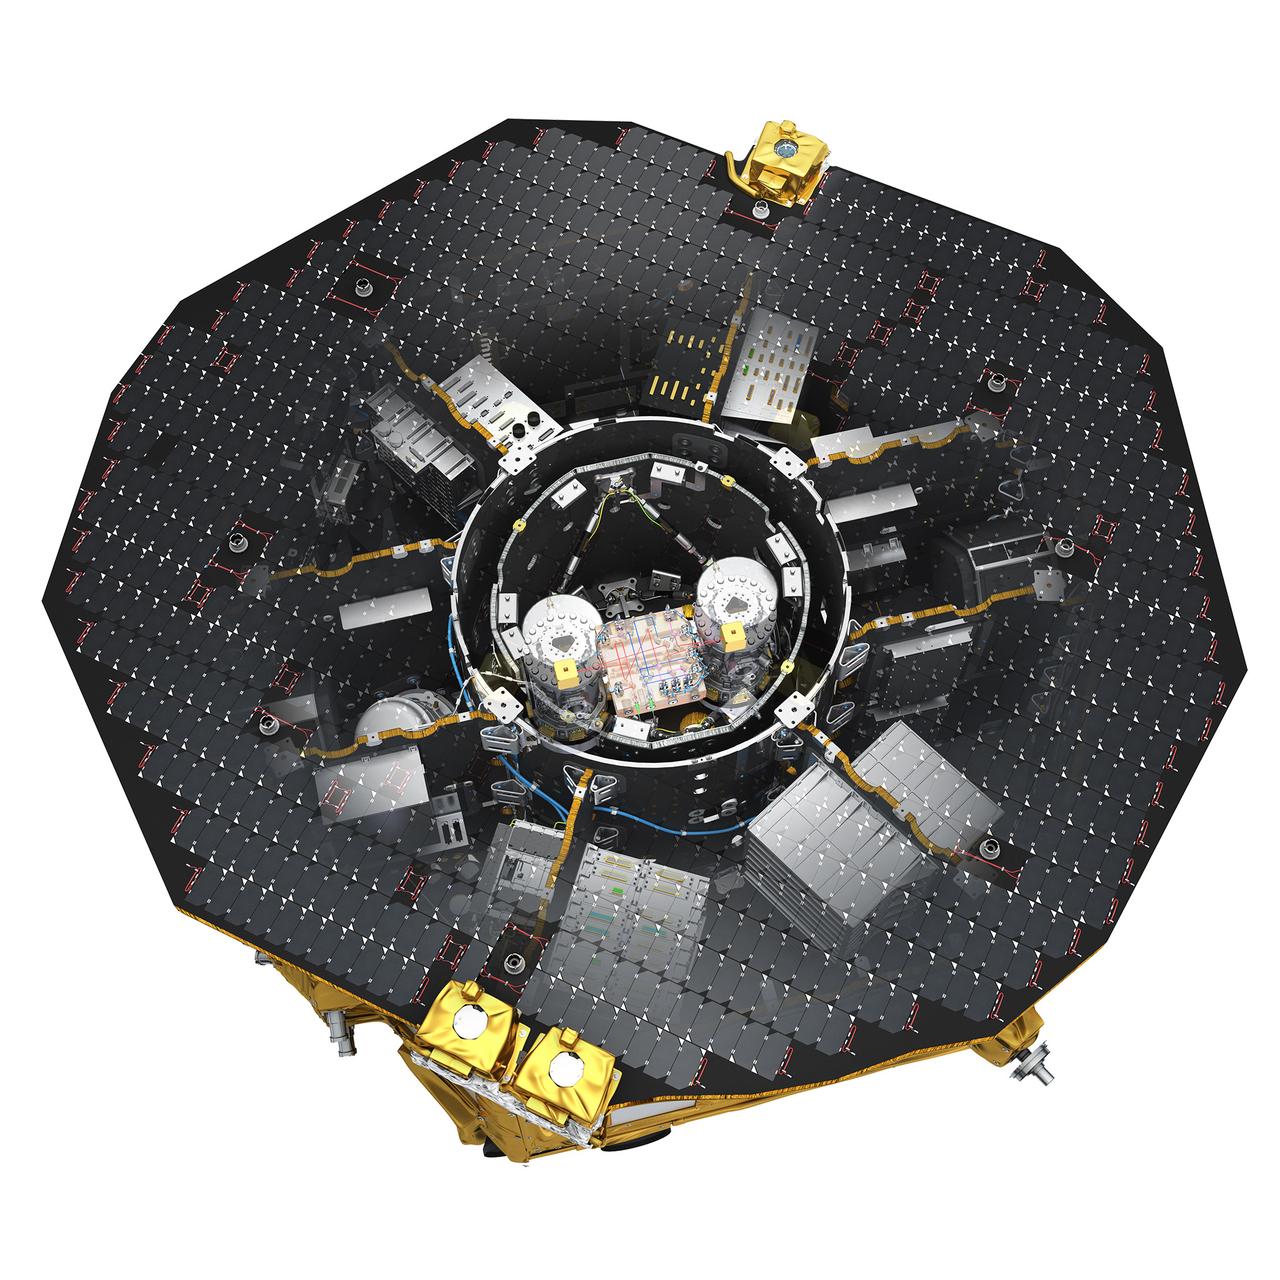 1567215927639-ESA_LISA_Pathfinder_SpacecraftTransparent_view3_1280.jpg